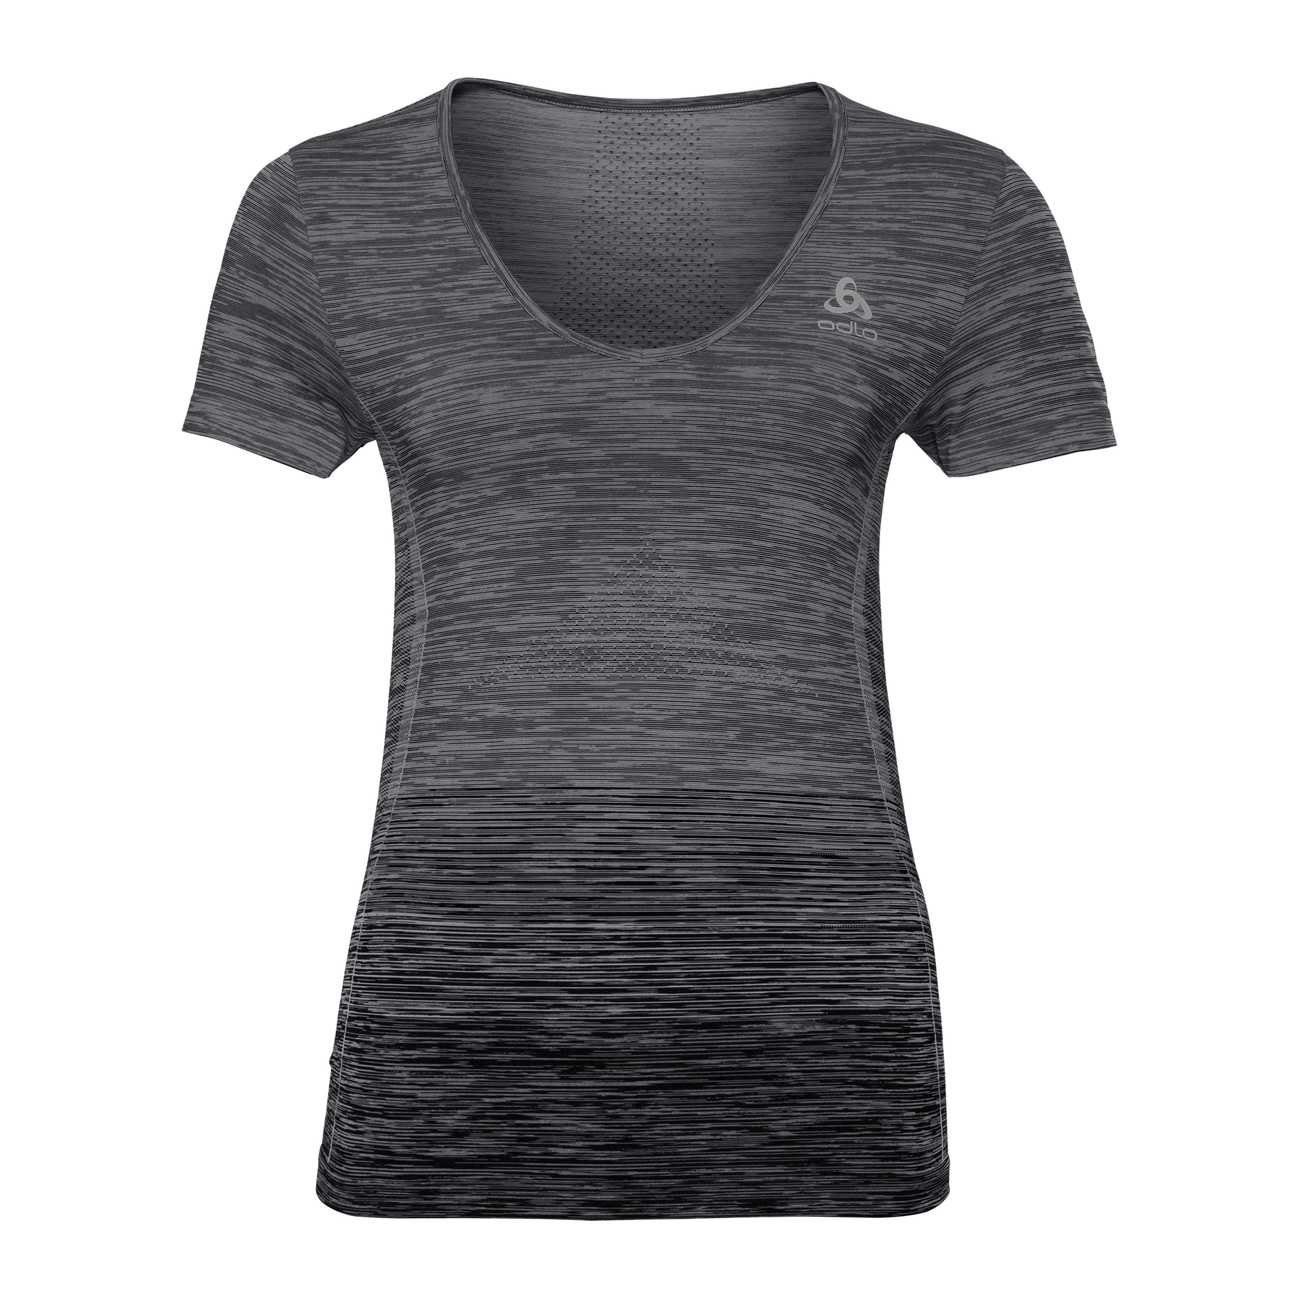 An image of Odlo Women's Maia Seamless Short Sleeve T-Shirt- Steel Grey - XS, STEEL GREY/B...